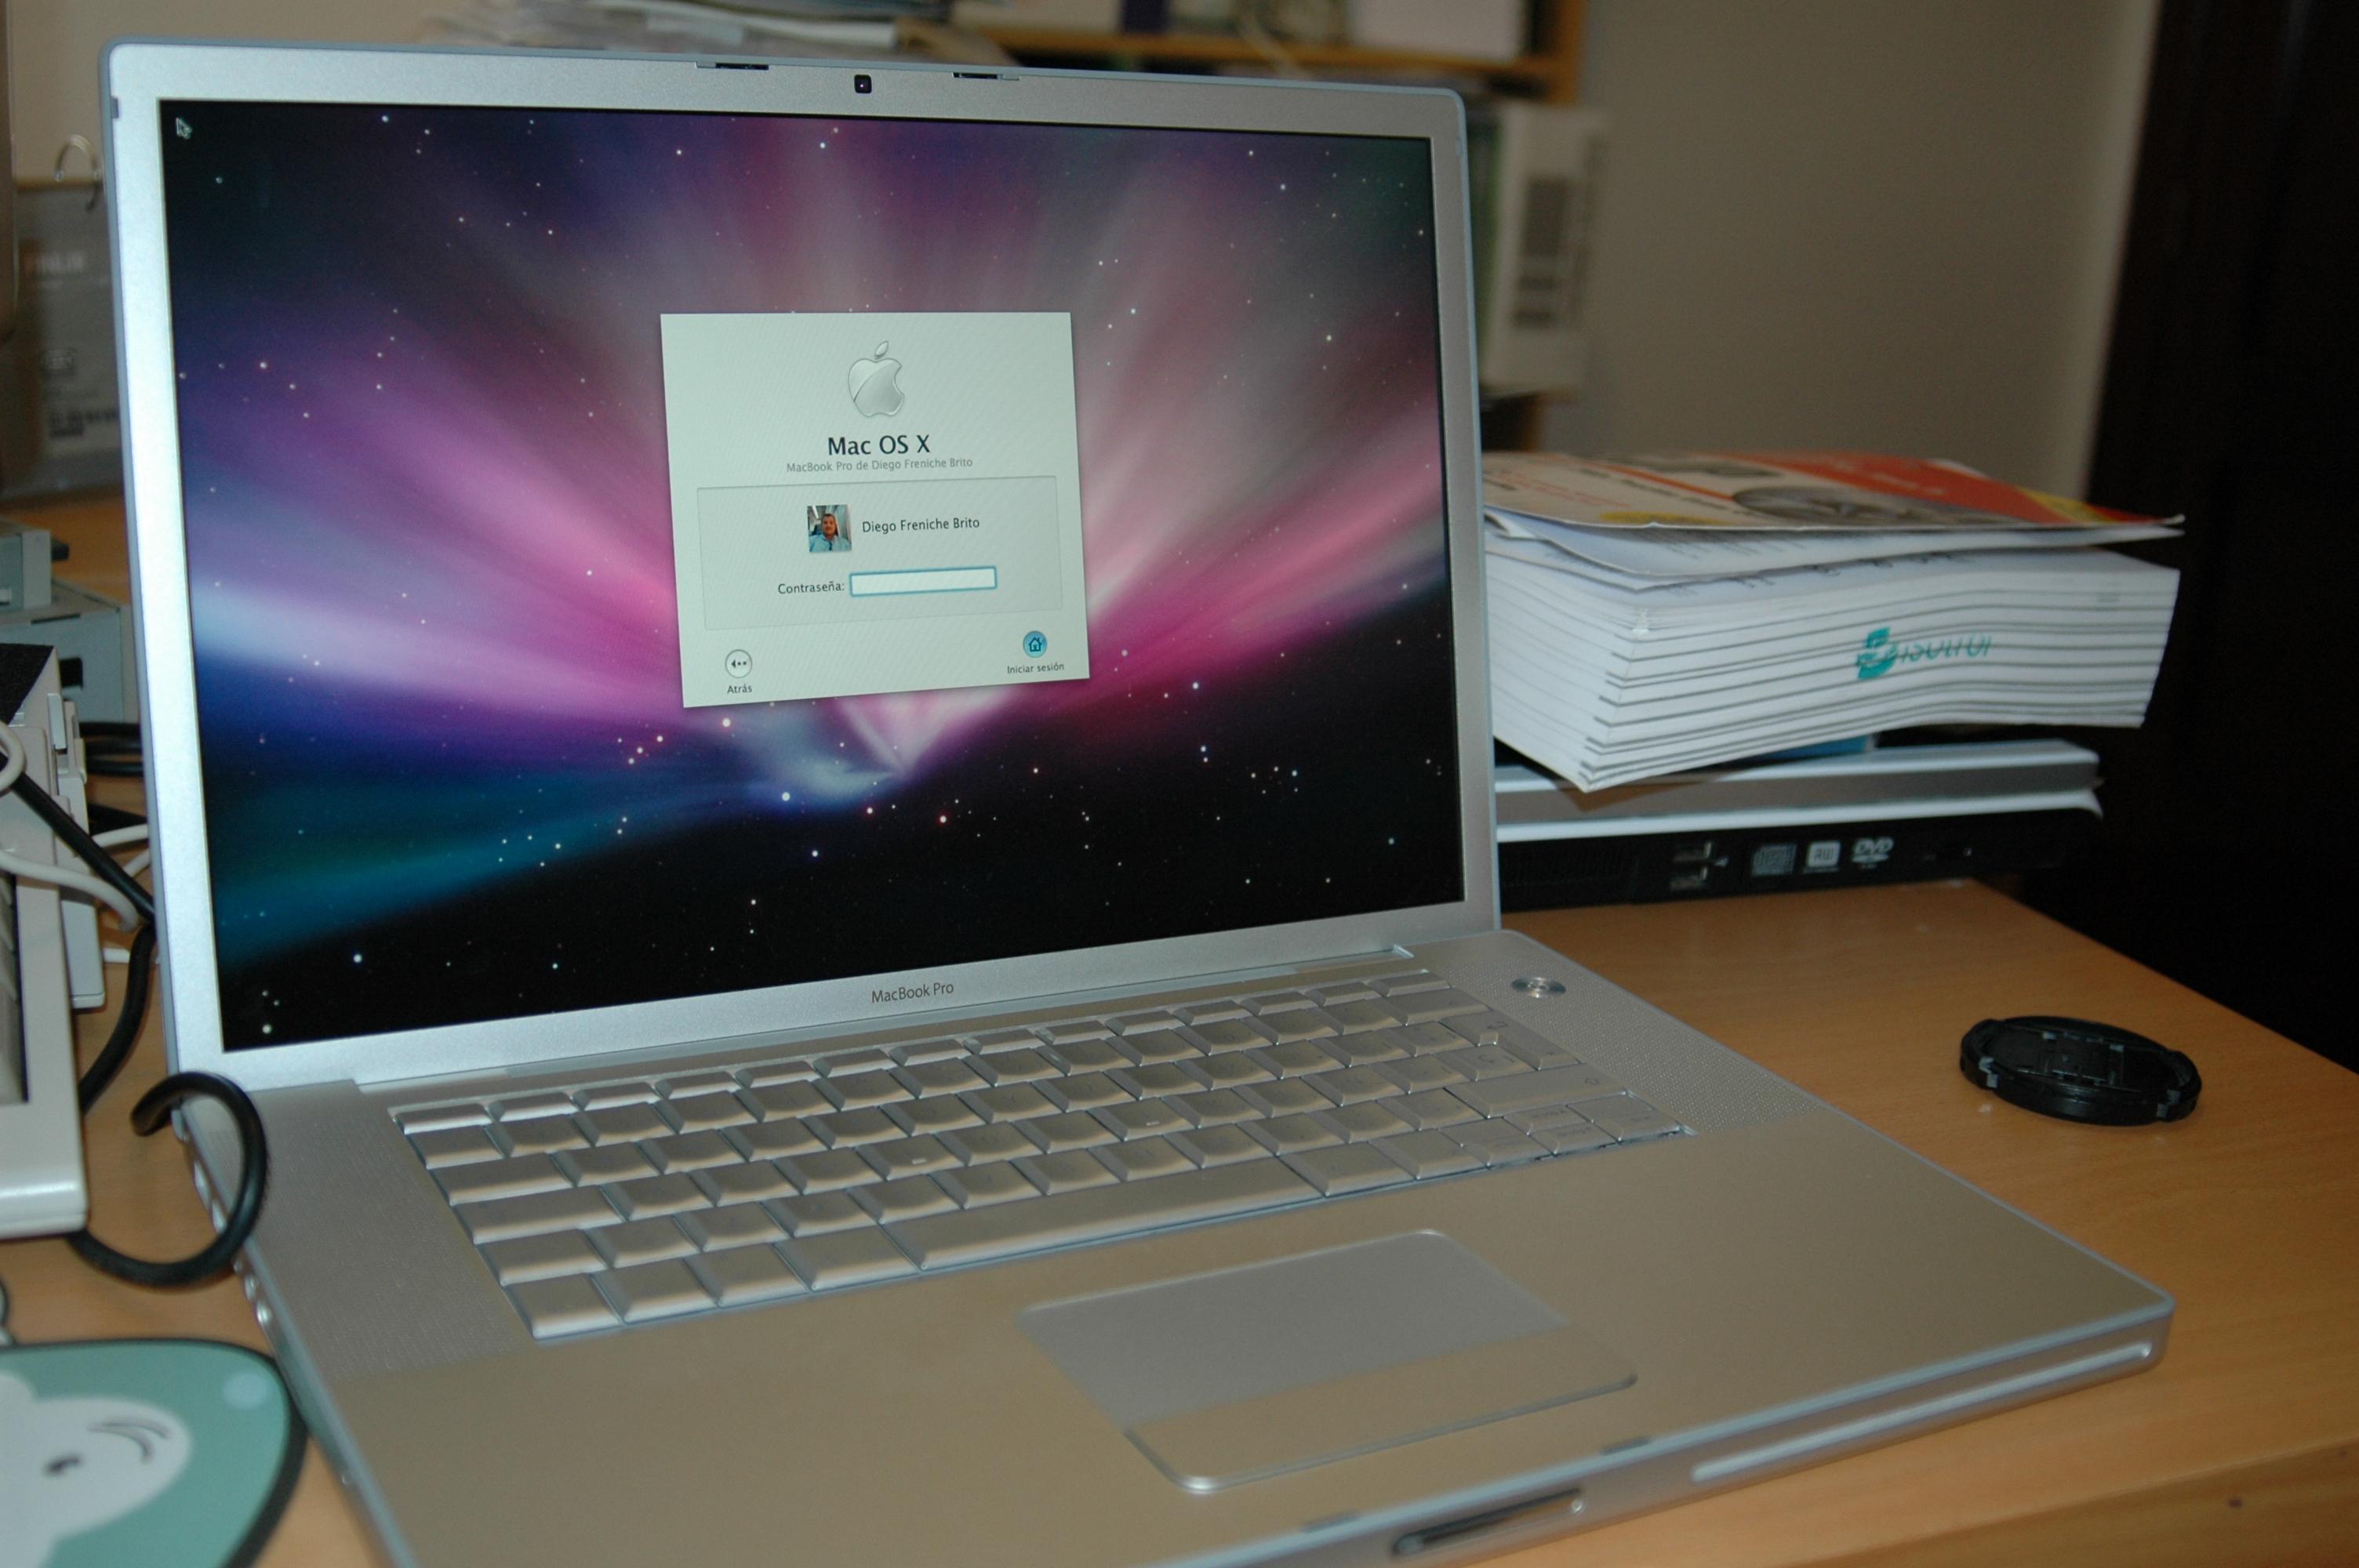 Mi MacBook Pro